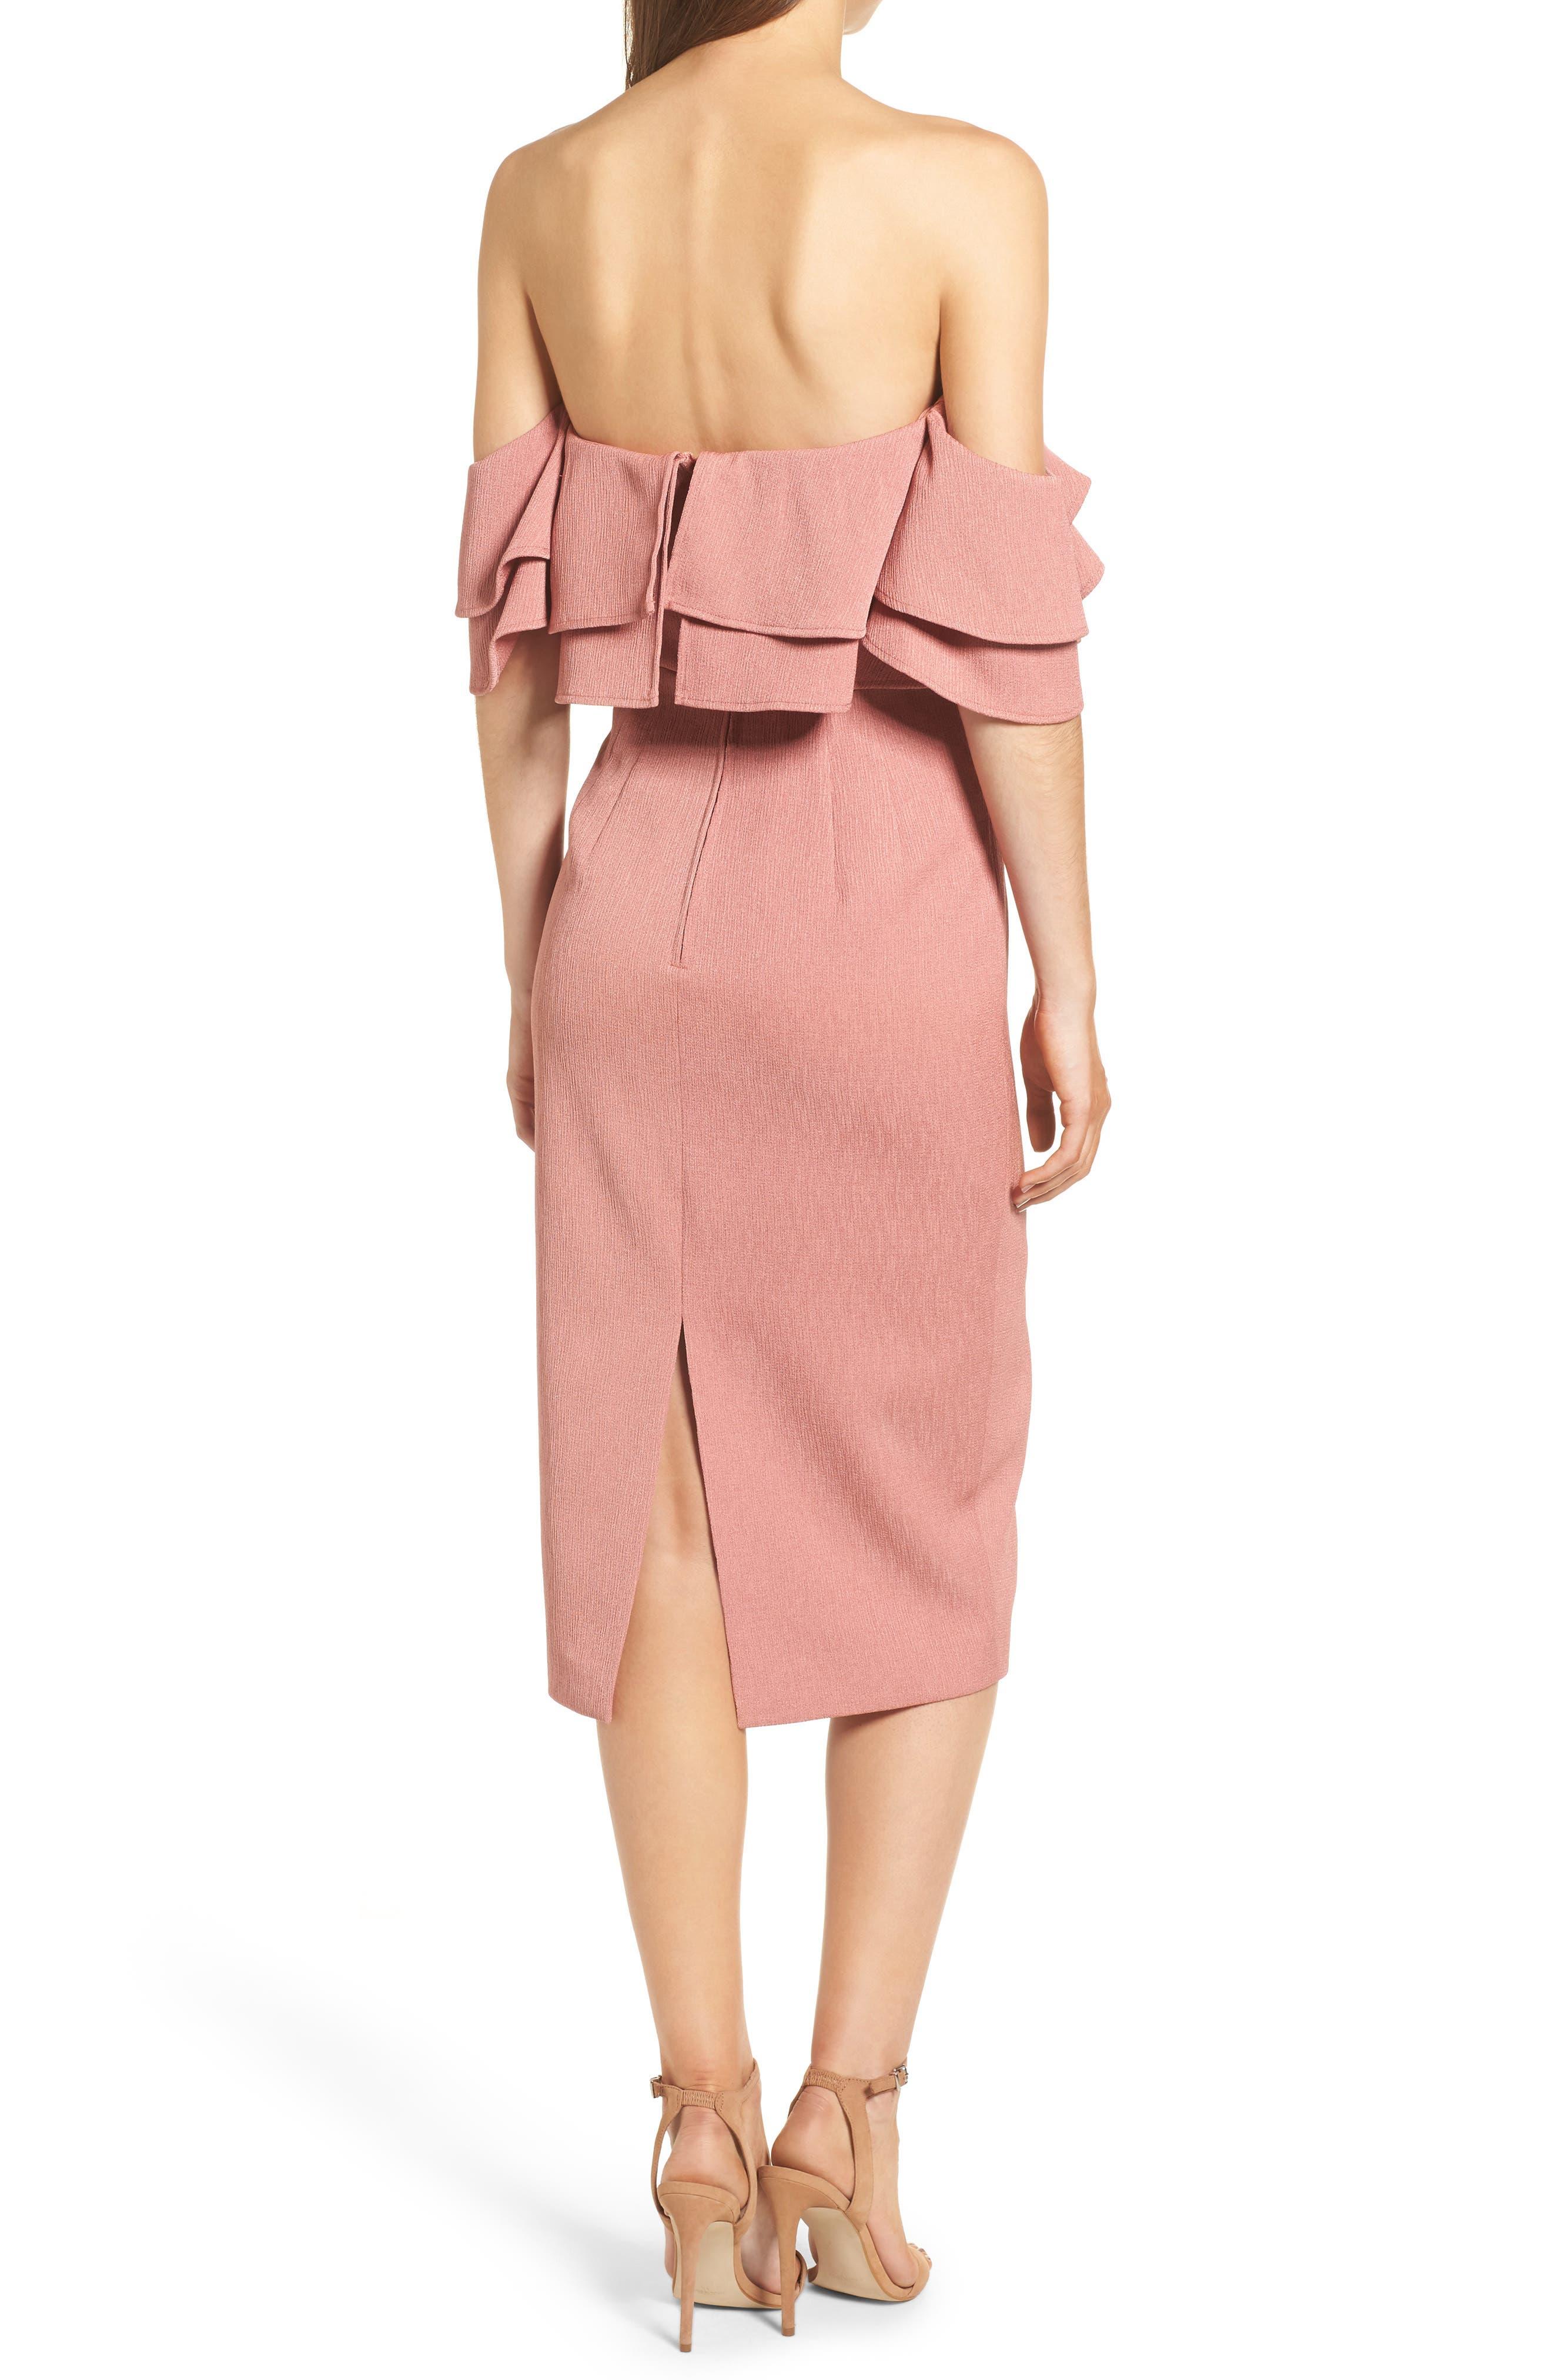 No Reason Off the Shoulder Sheath Dress,                             Alternate thumbnail 2, color,                             650